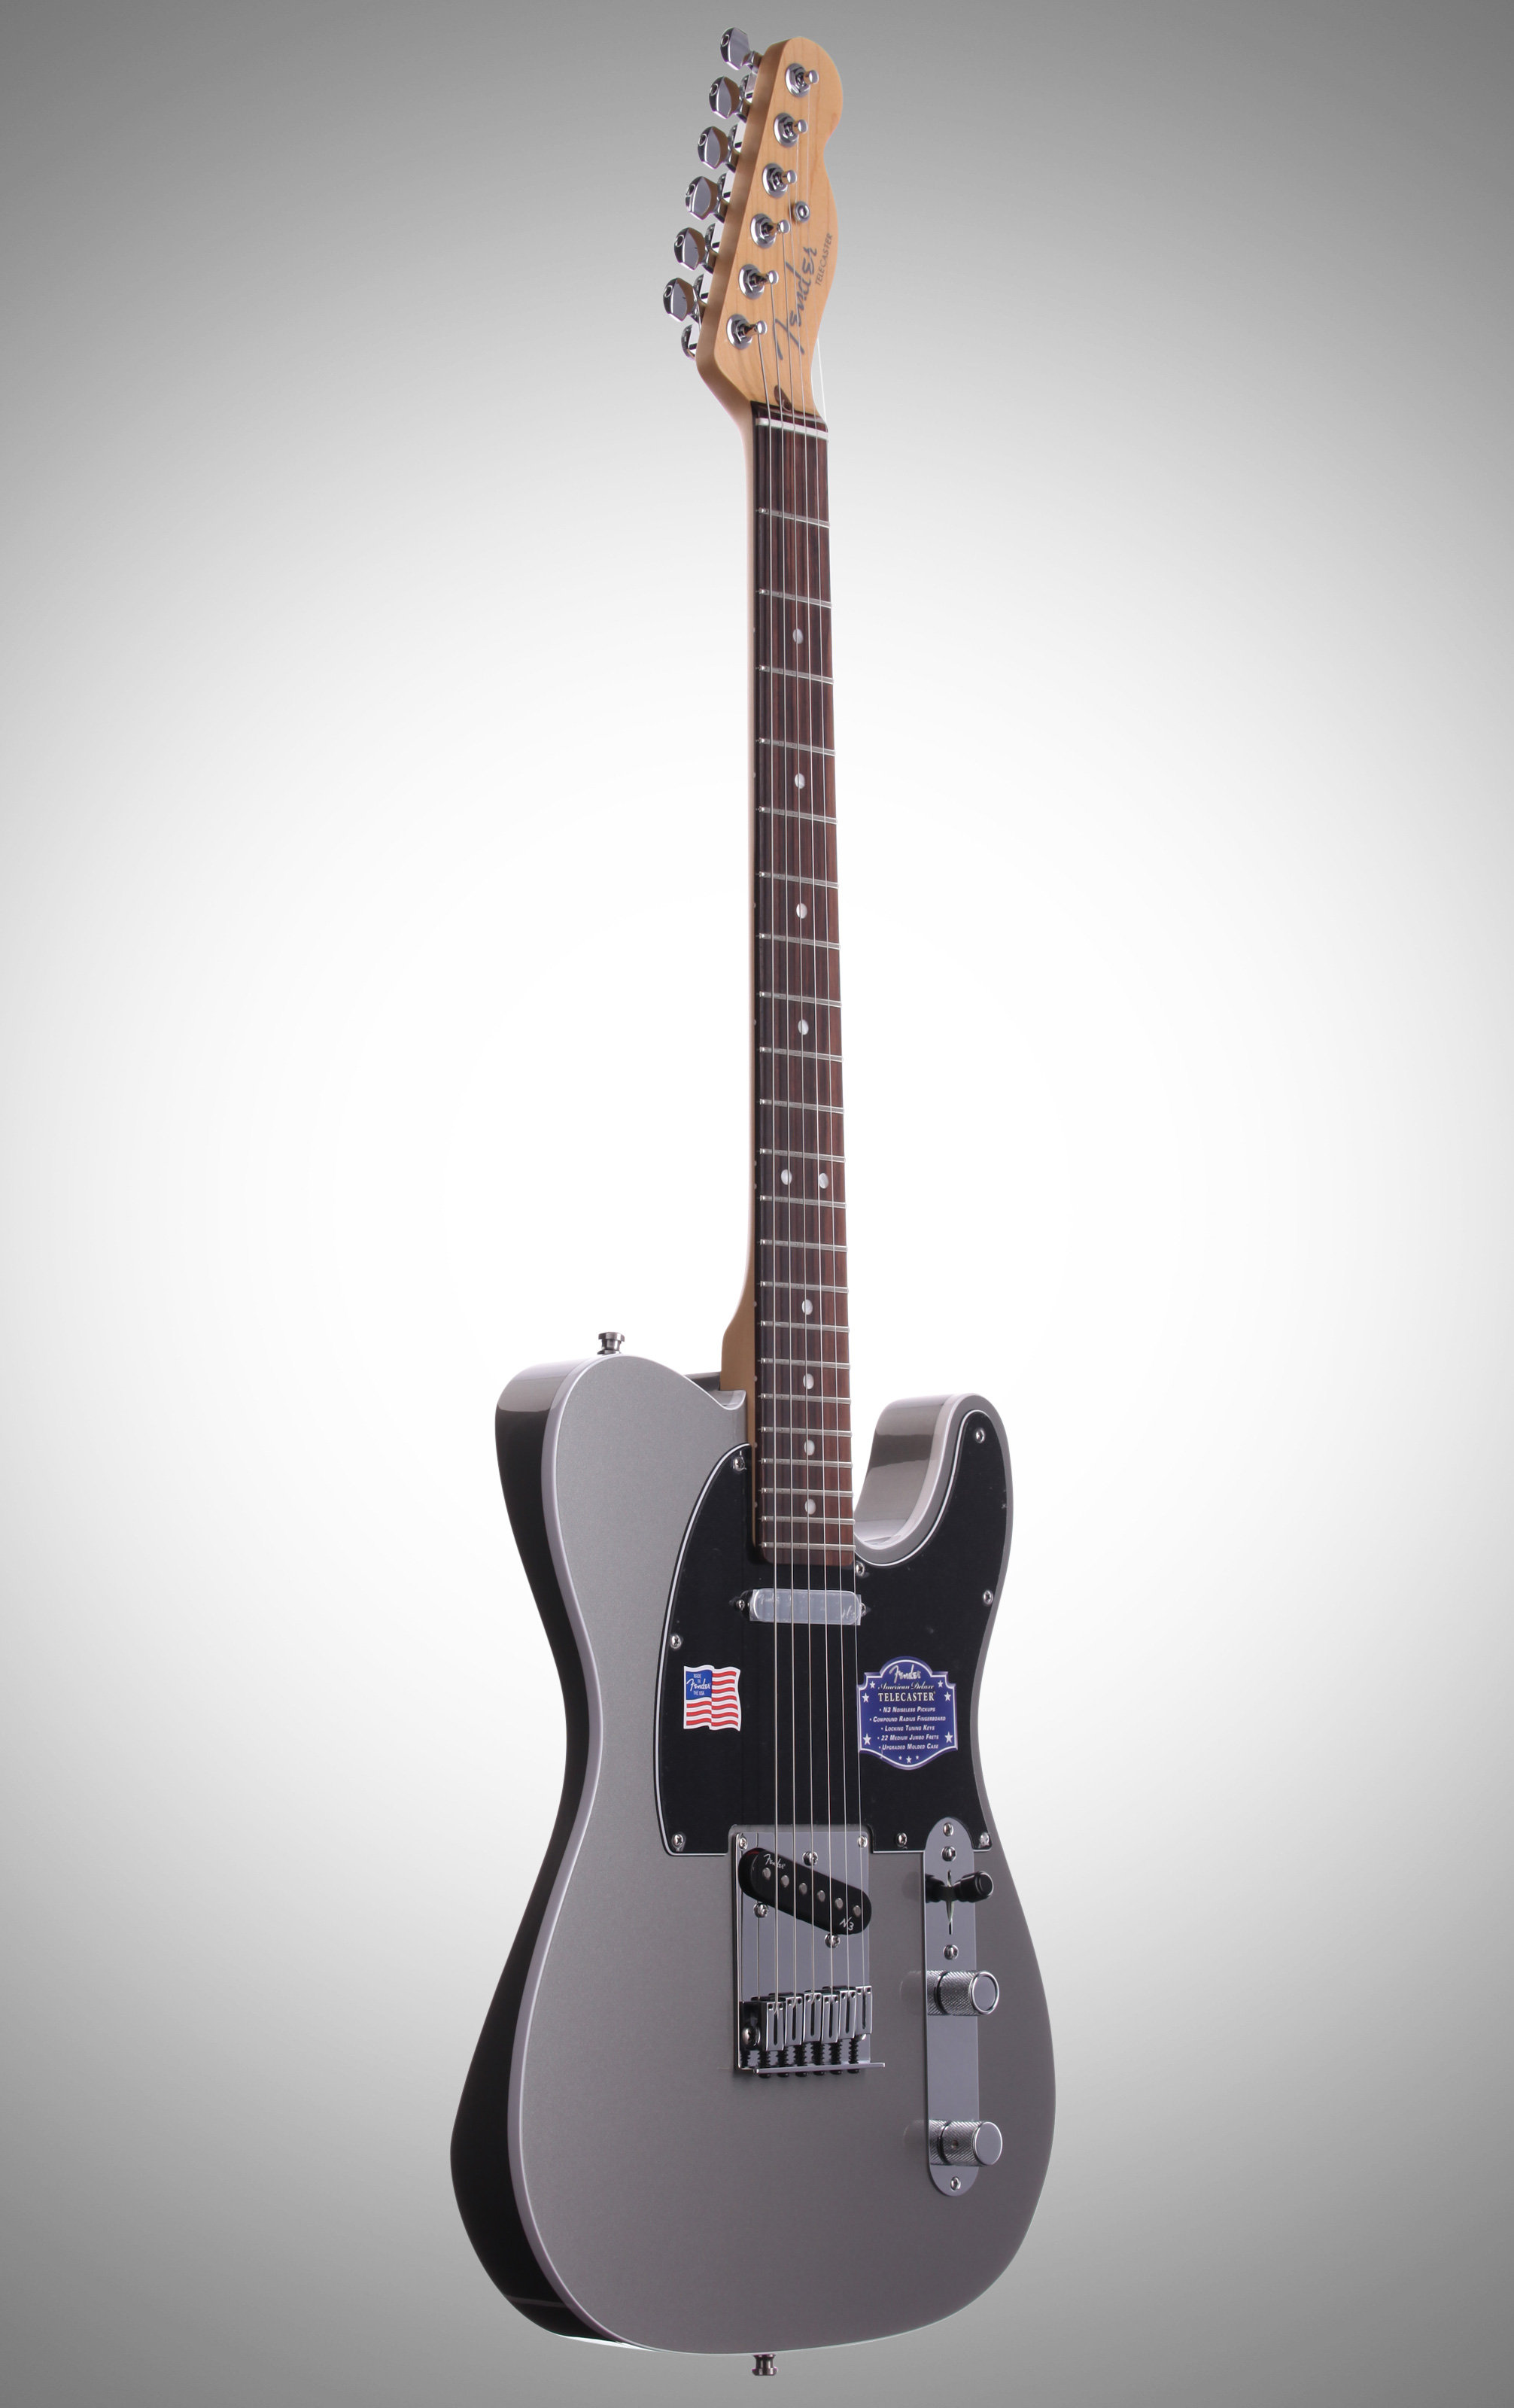 fender telecaster s1 wiring diagram 110 atv american deluxe electric guitar rosewood